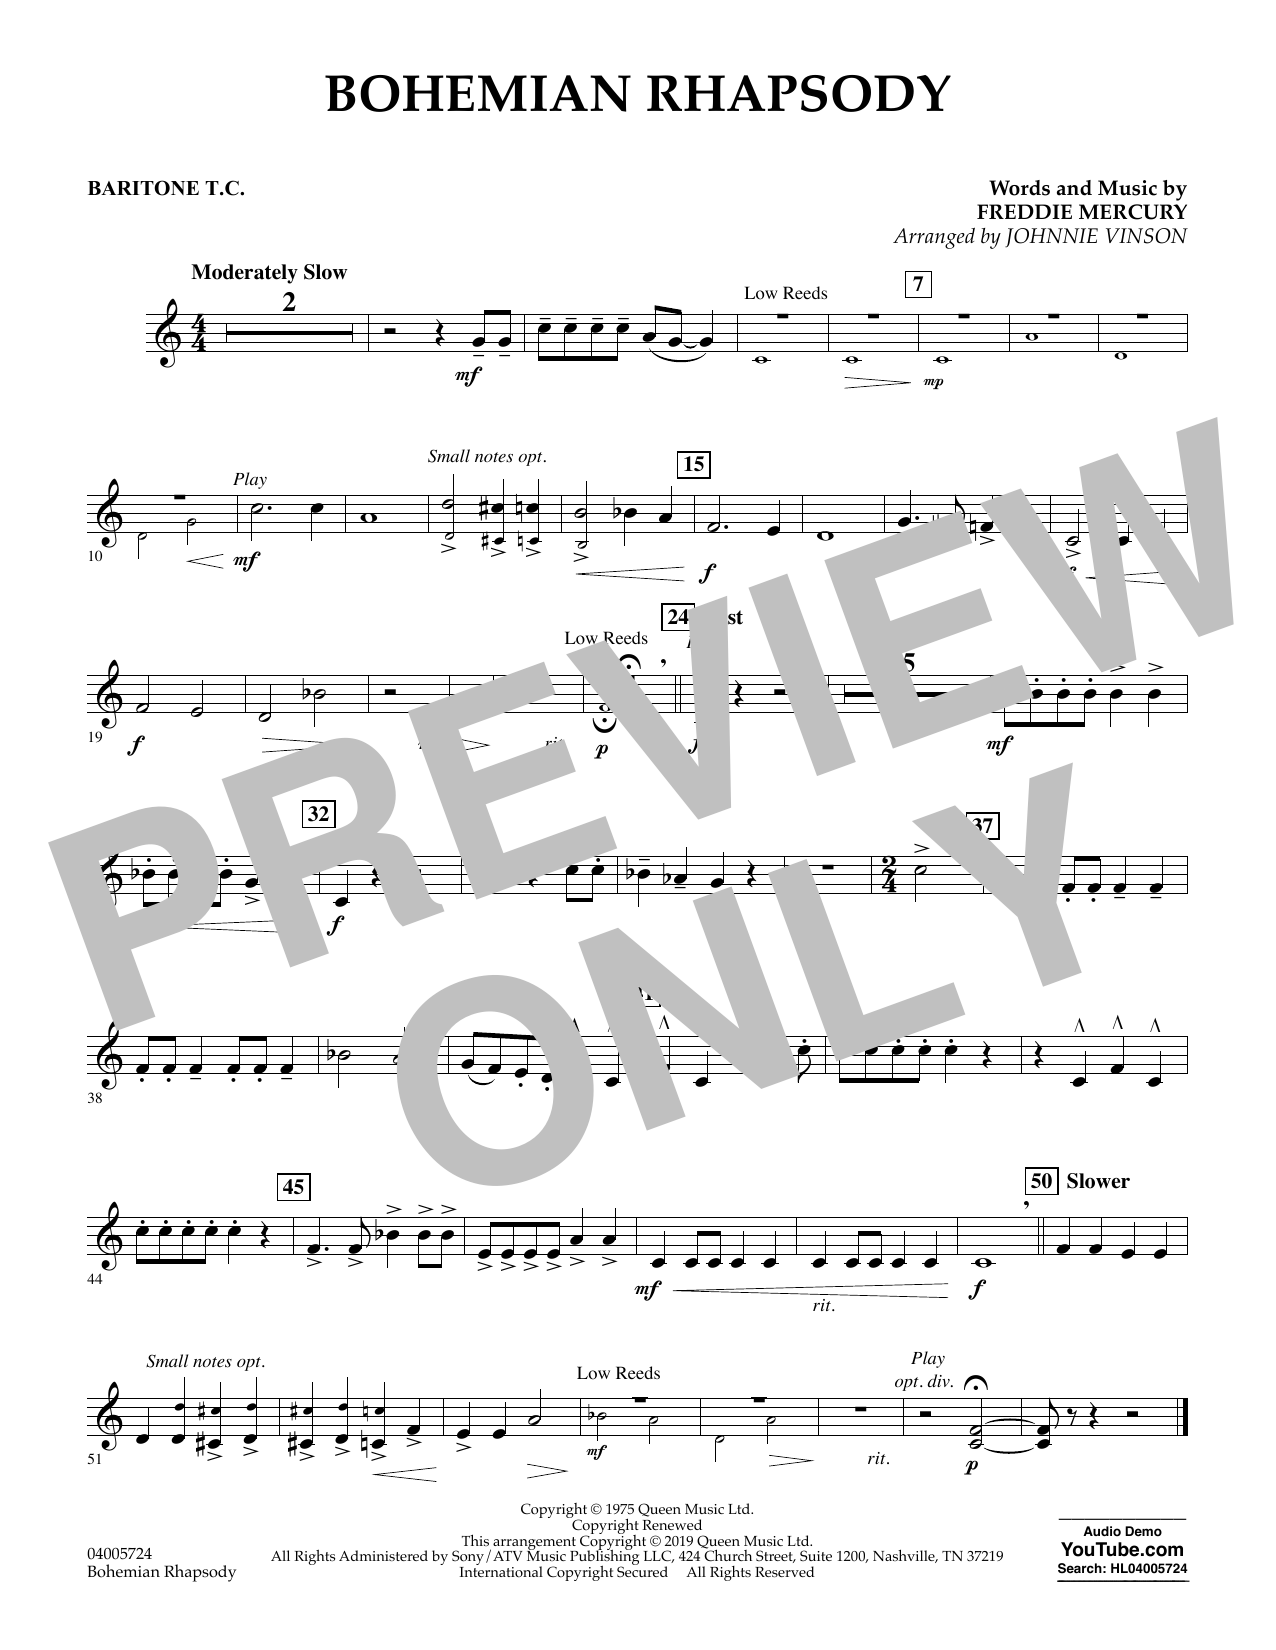 Bohemian Rhapsody (arr. Johnnie Vinson) - Baritone T.C. (Concert Band)